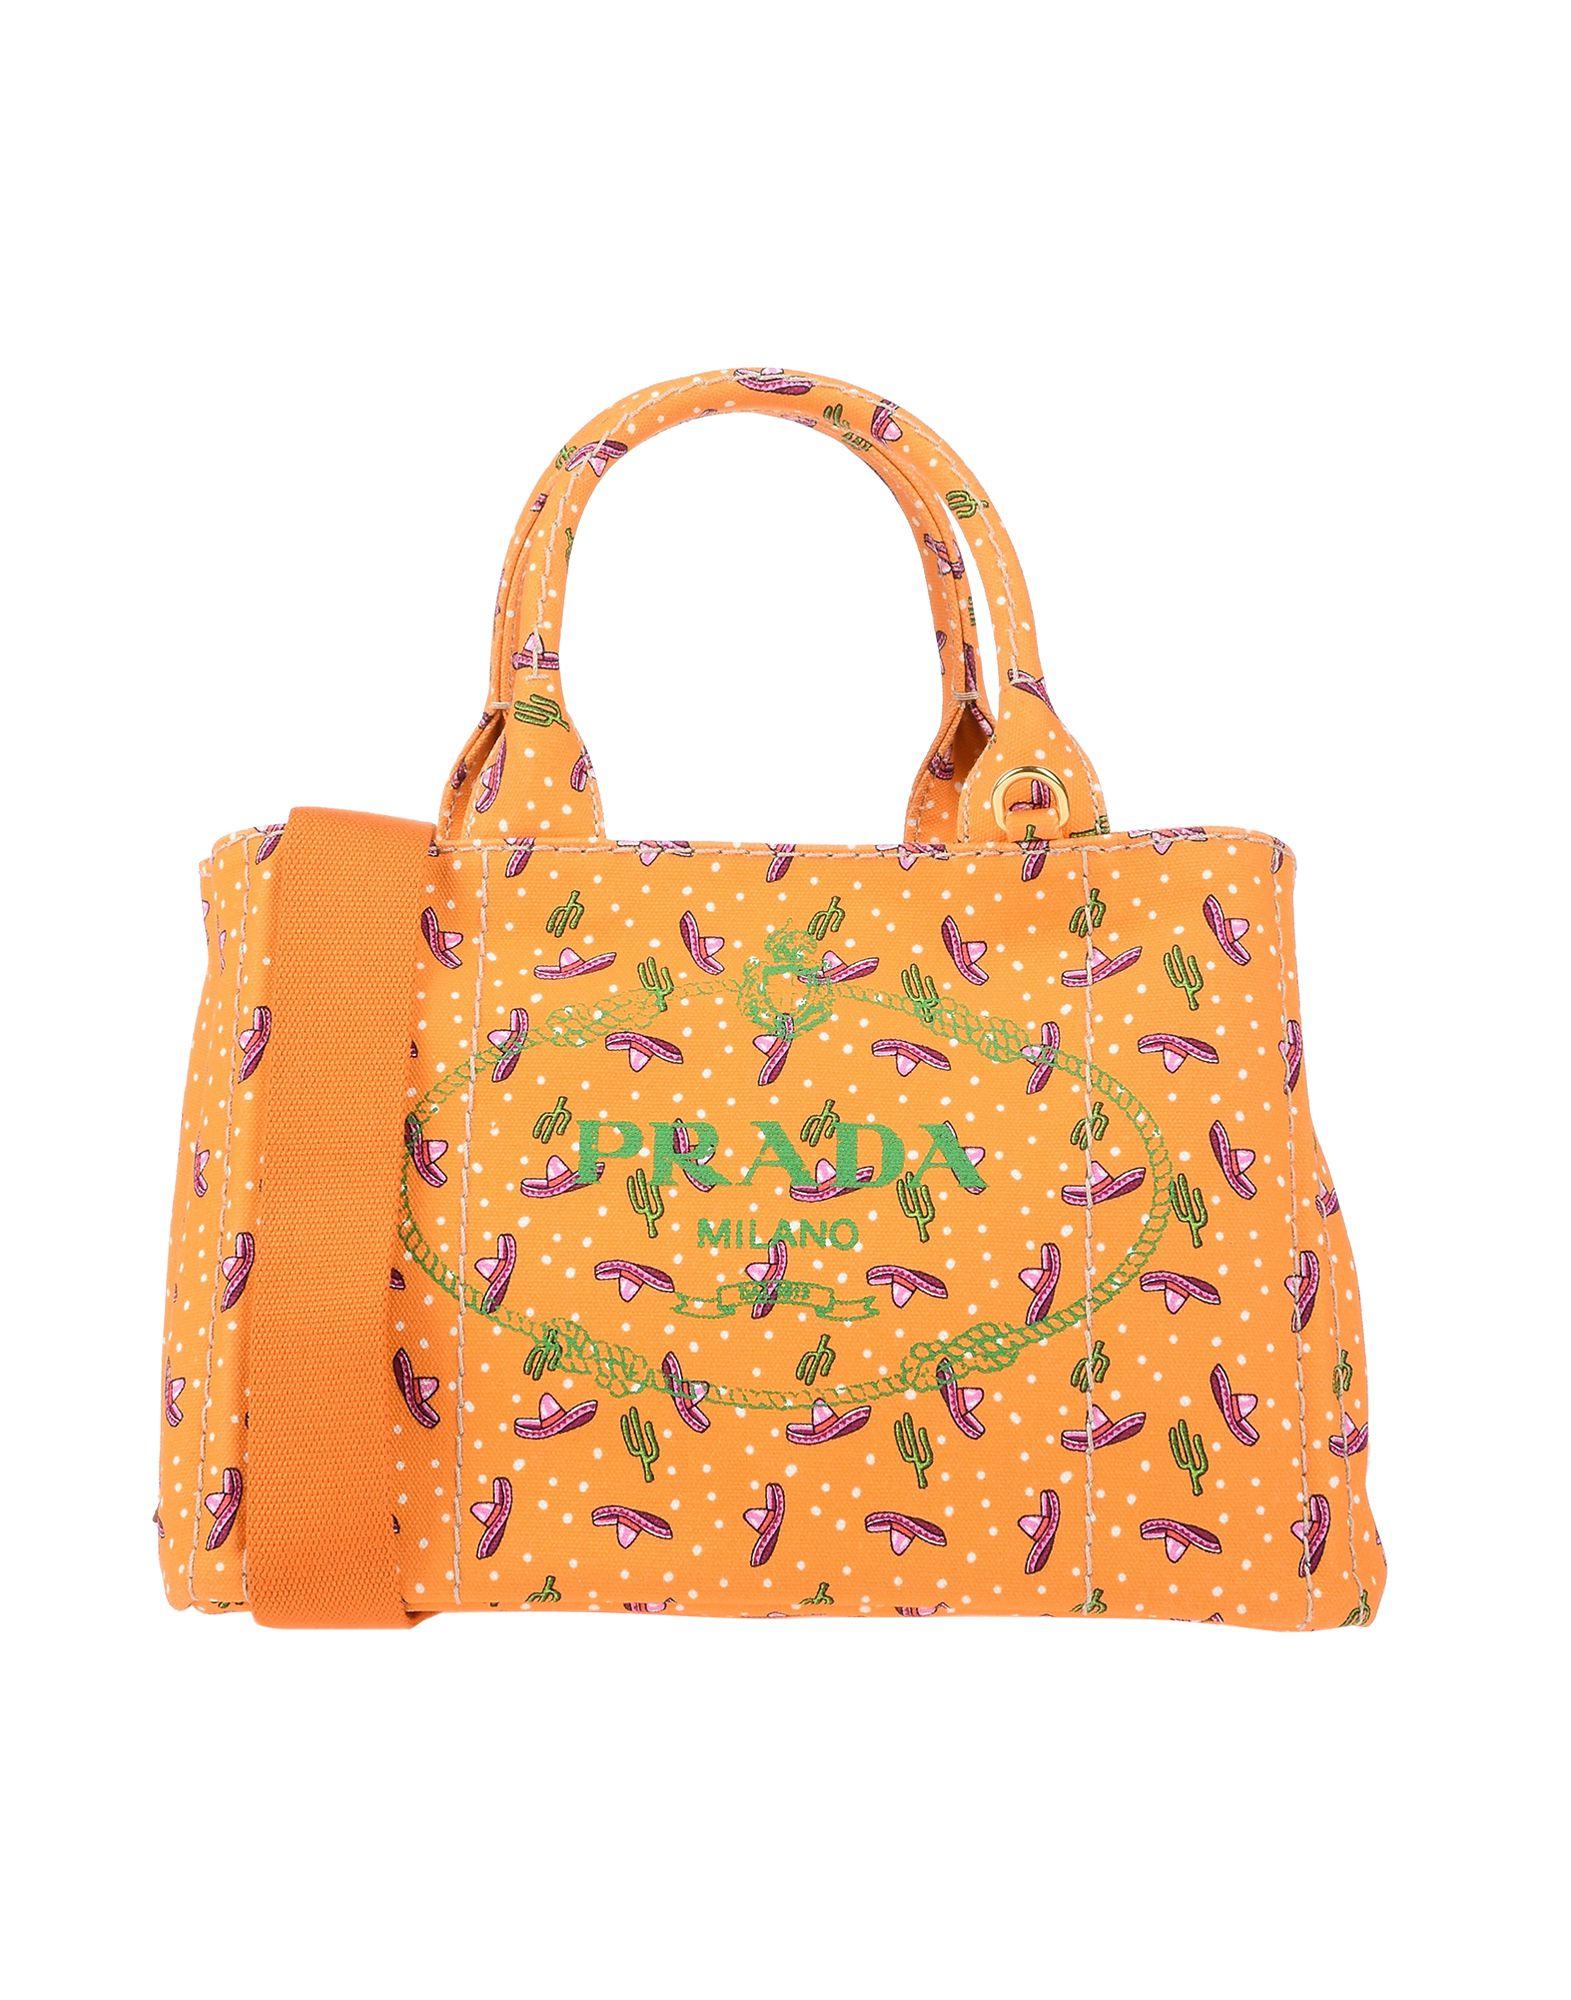 Prada Handbag - Women Prada Handbags online on YOOX United States ... 8bbec6db78